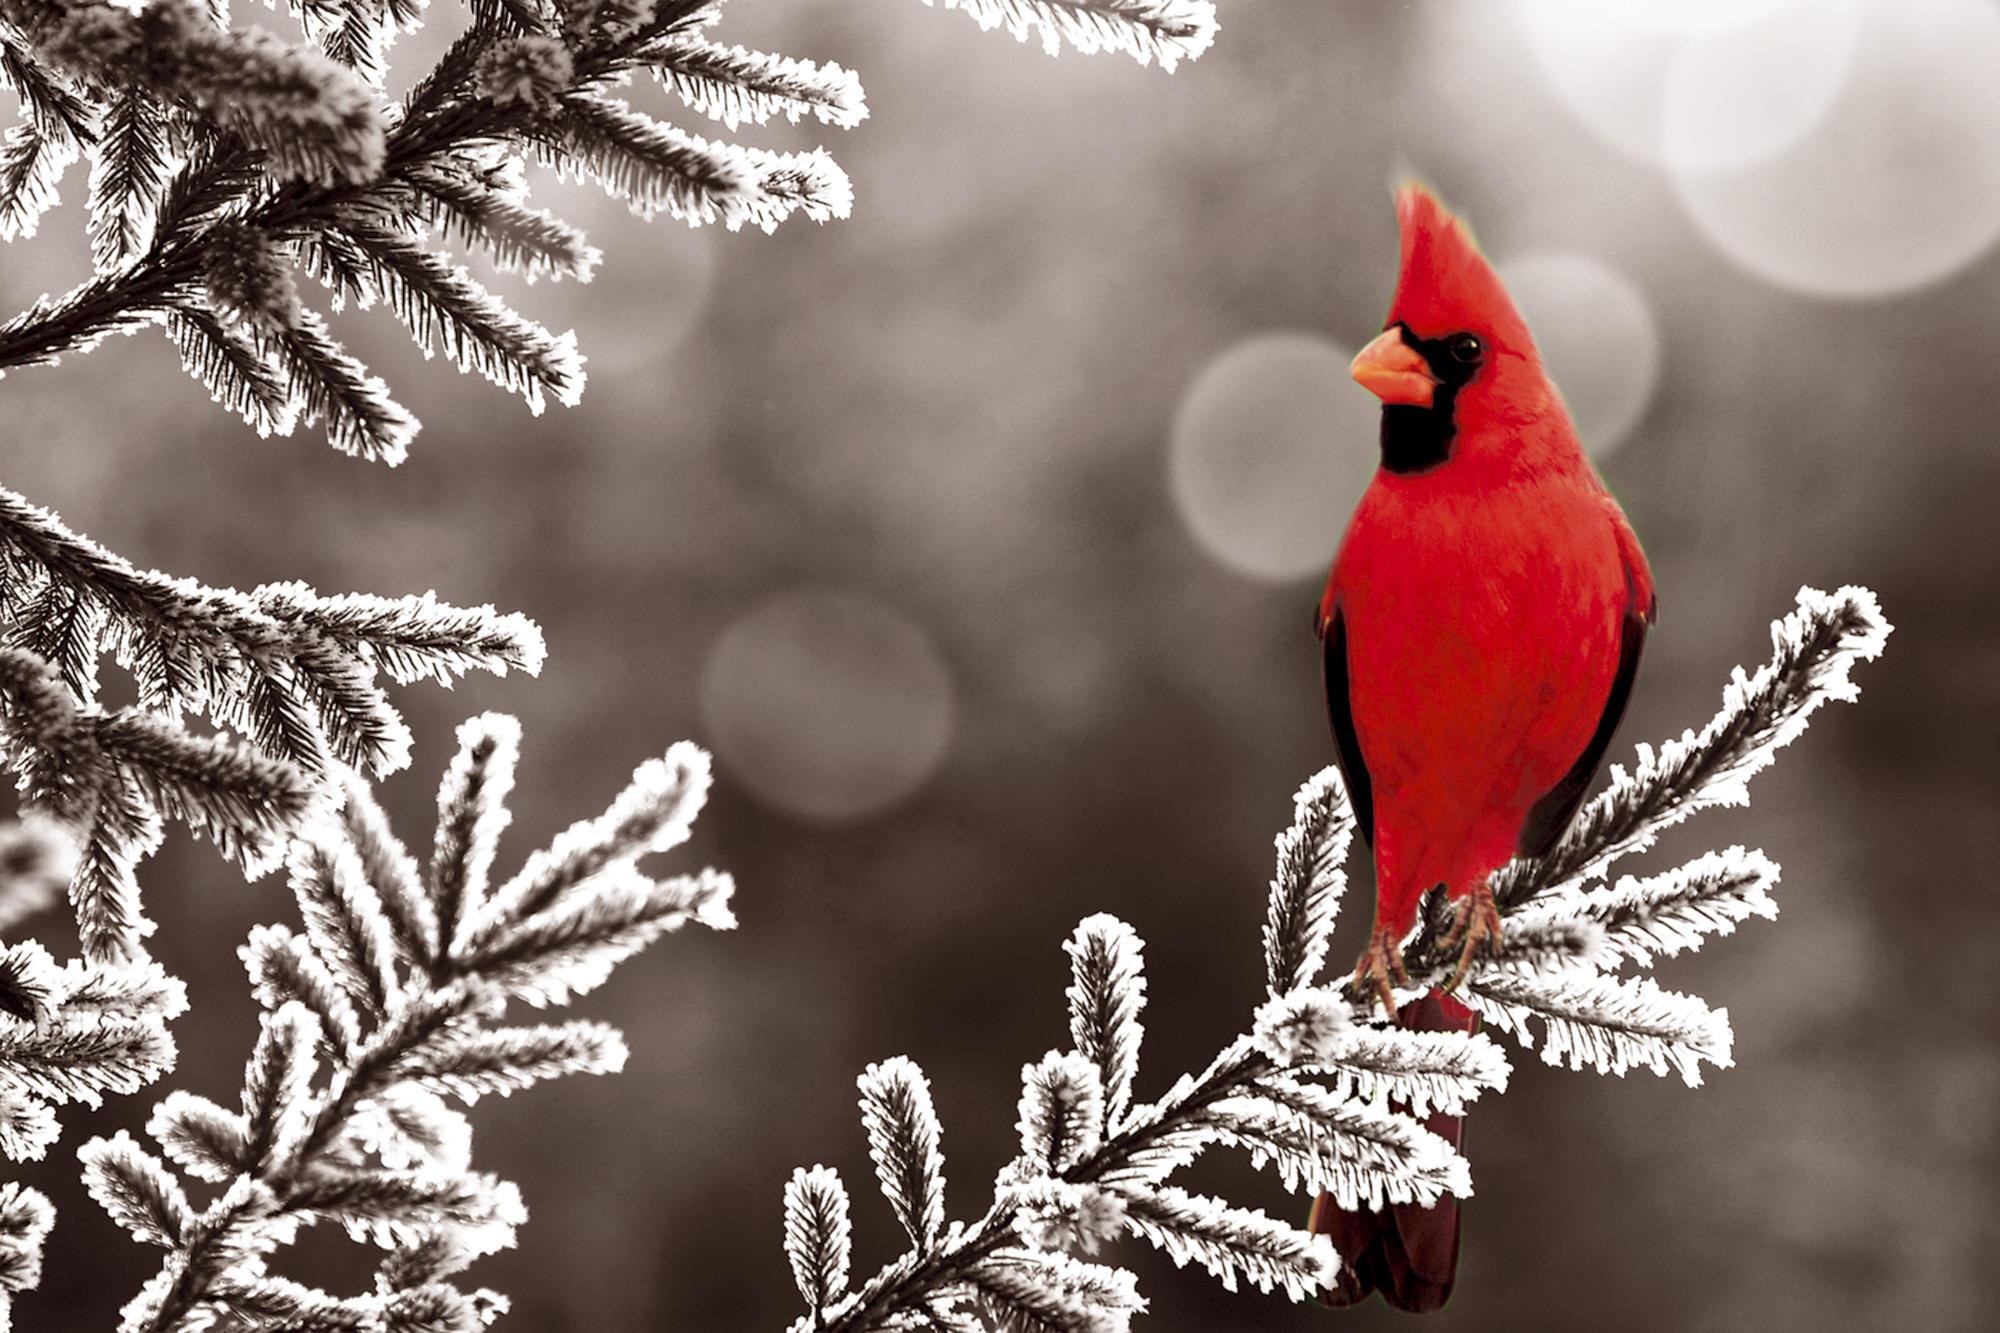 northern-cardinal-birds-hd-wallpapers-beautiful-desktop-backgrounds-